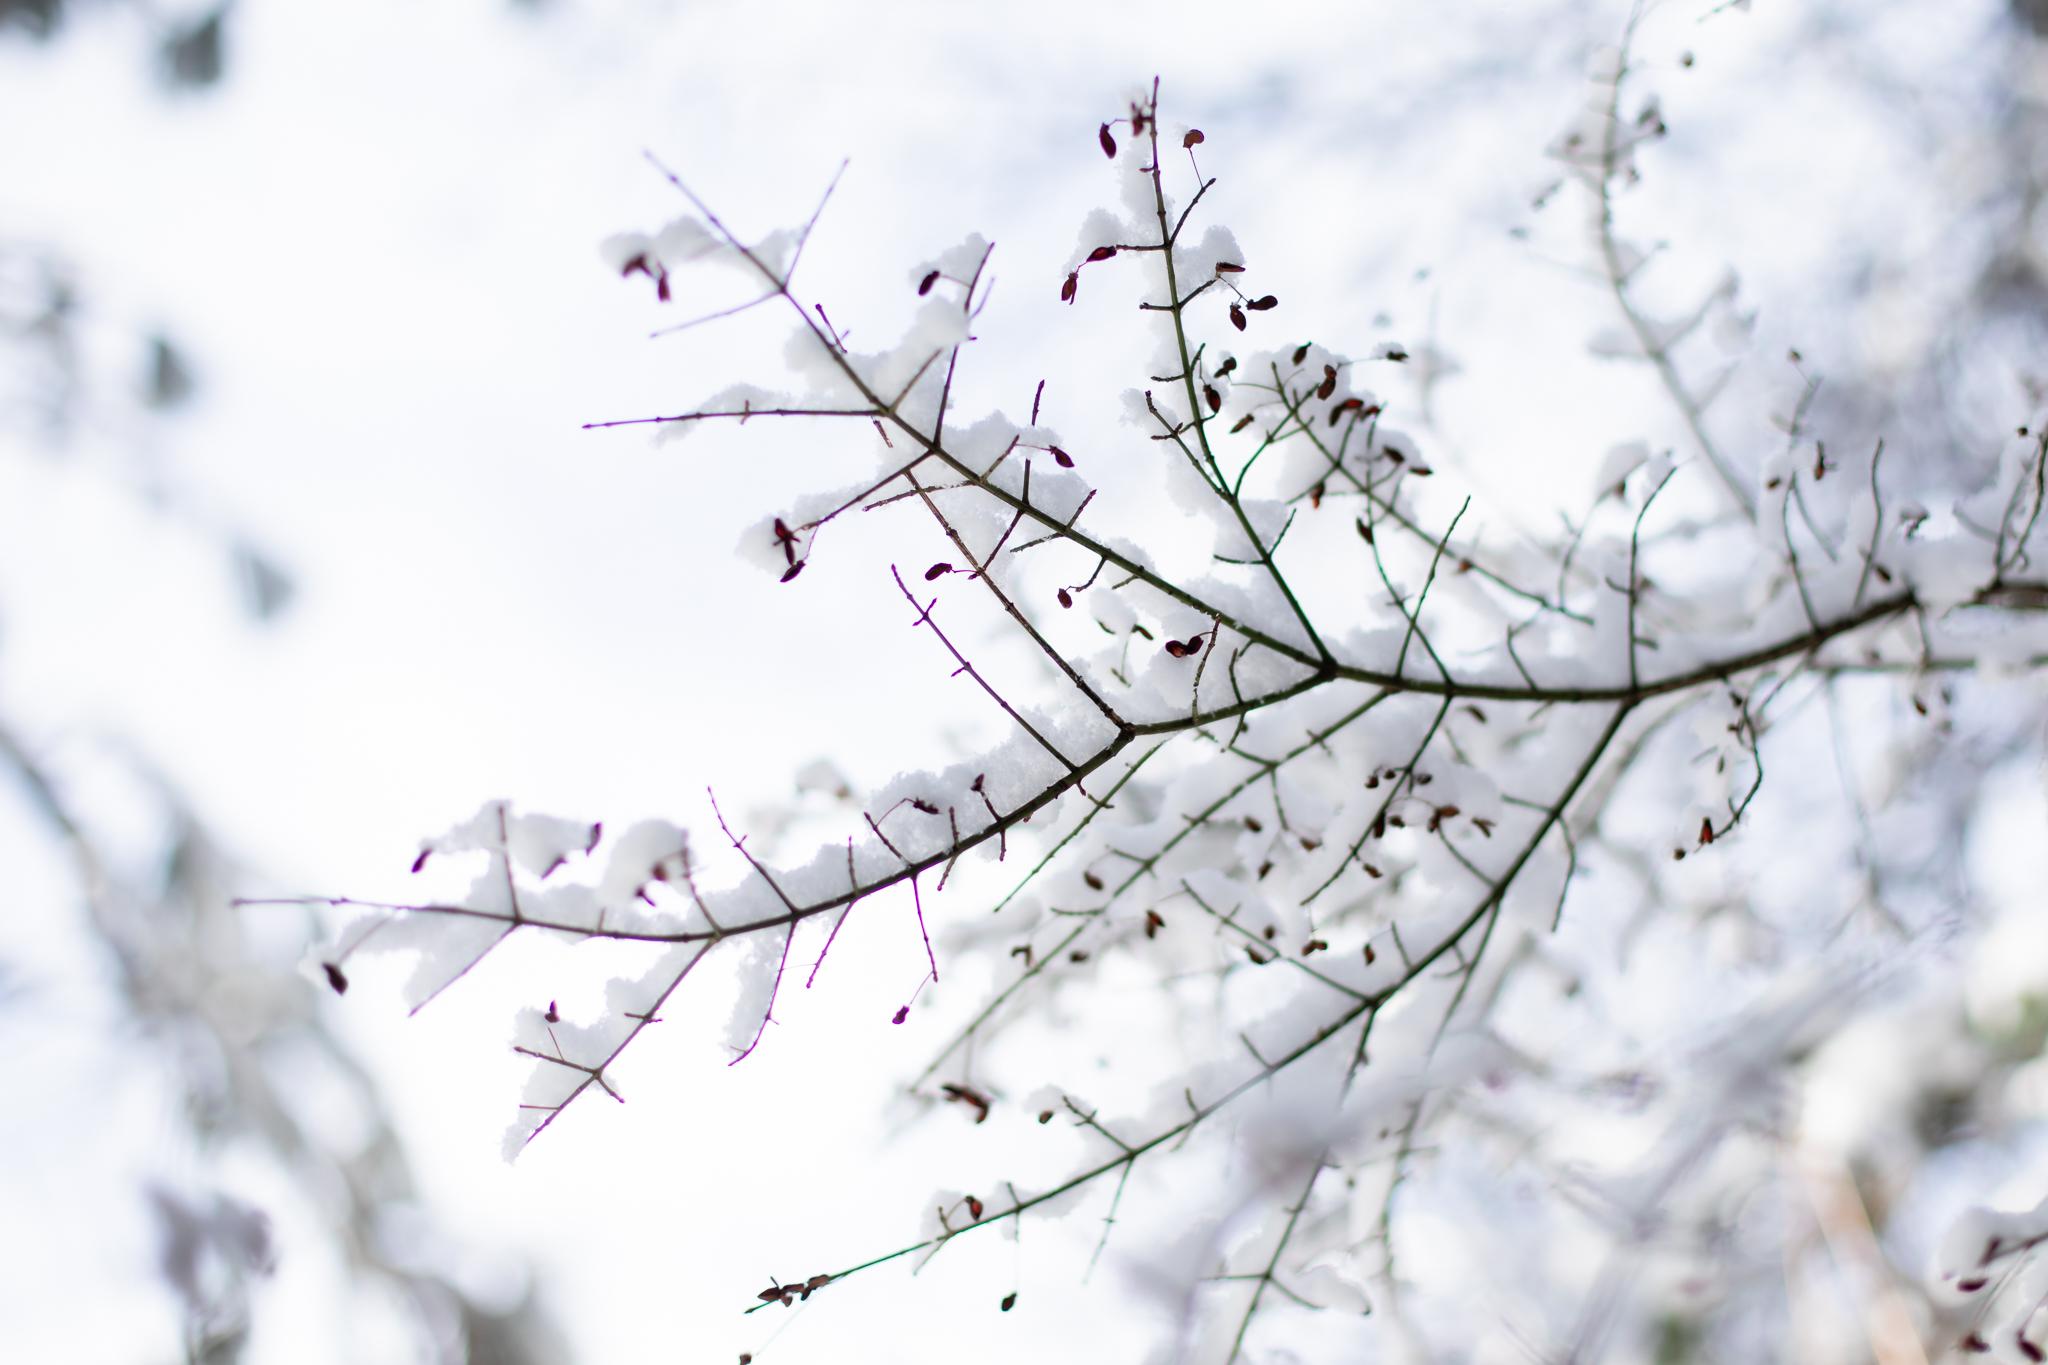 Snow | Lenkaland Photography